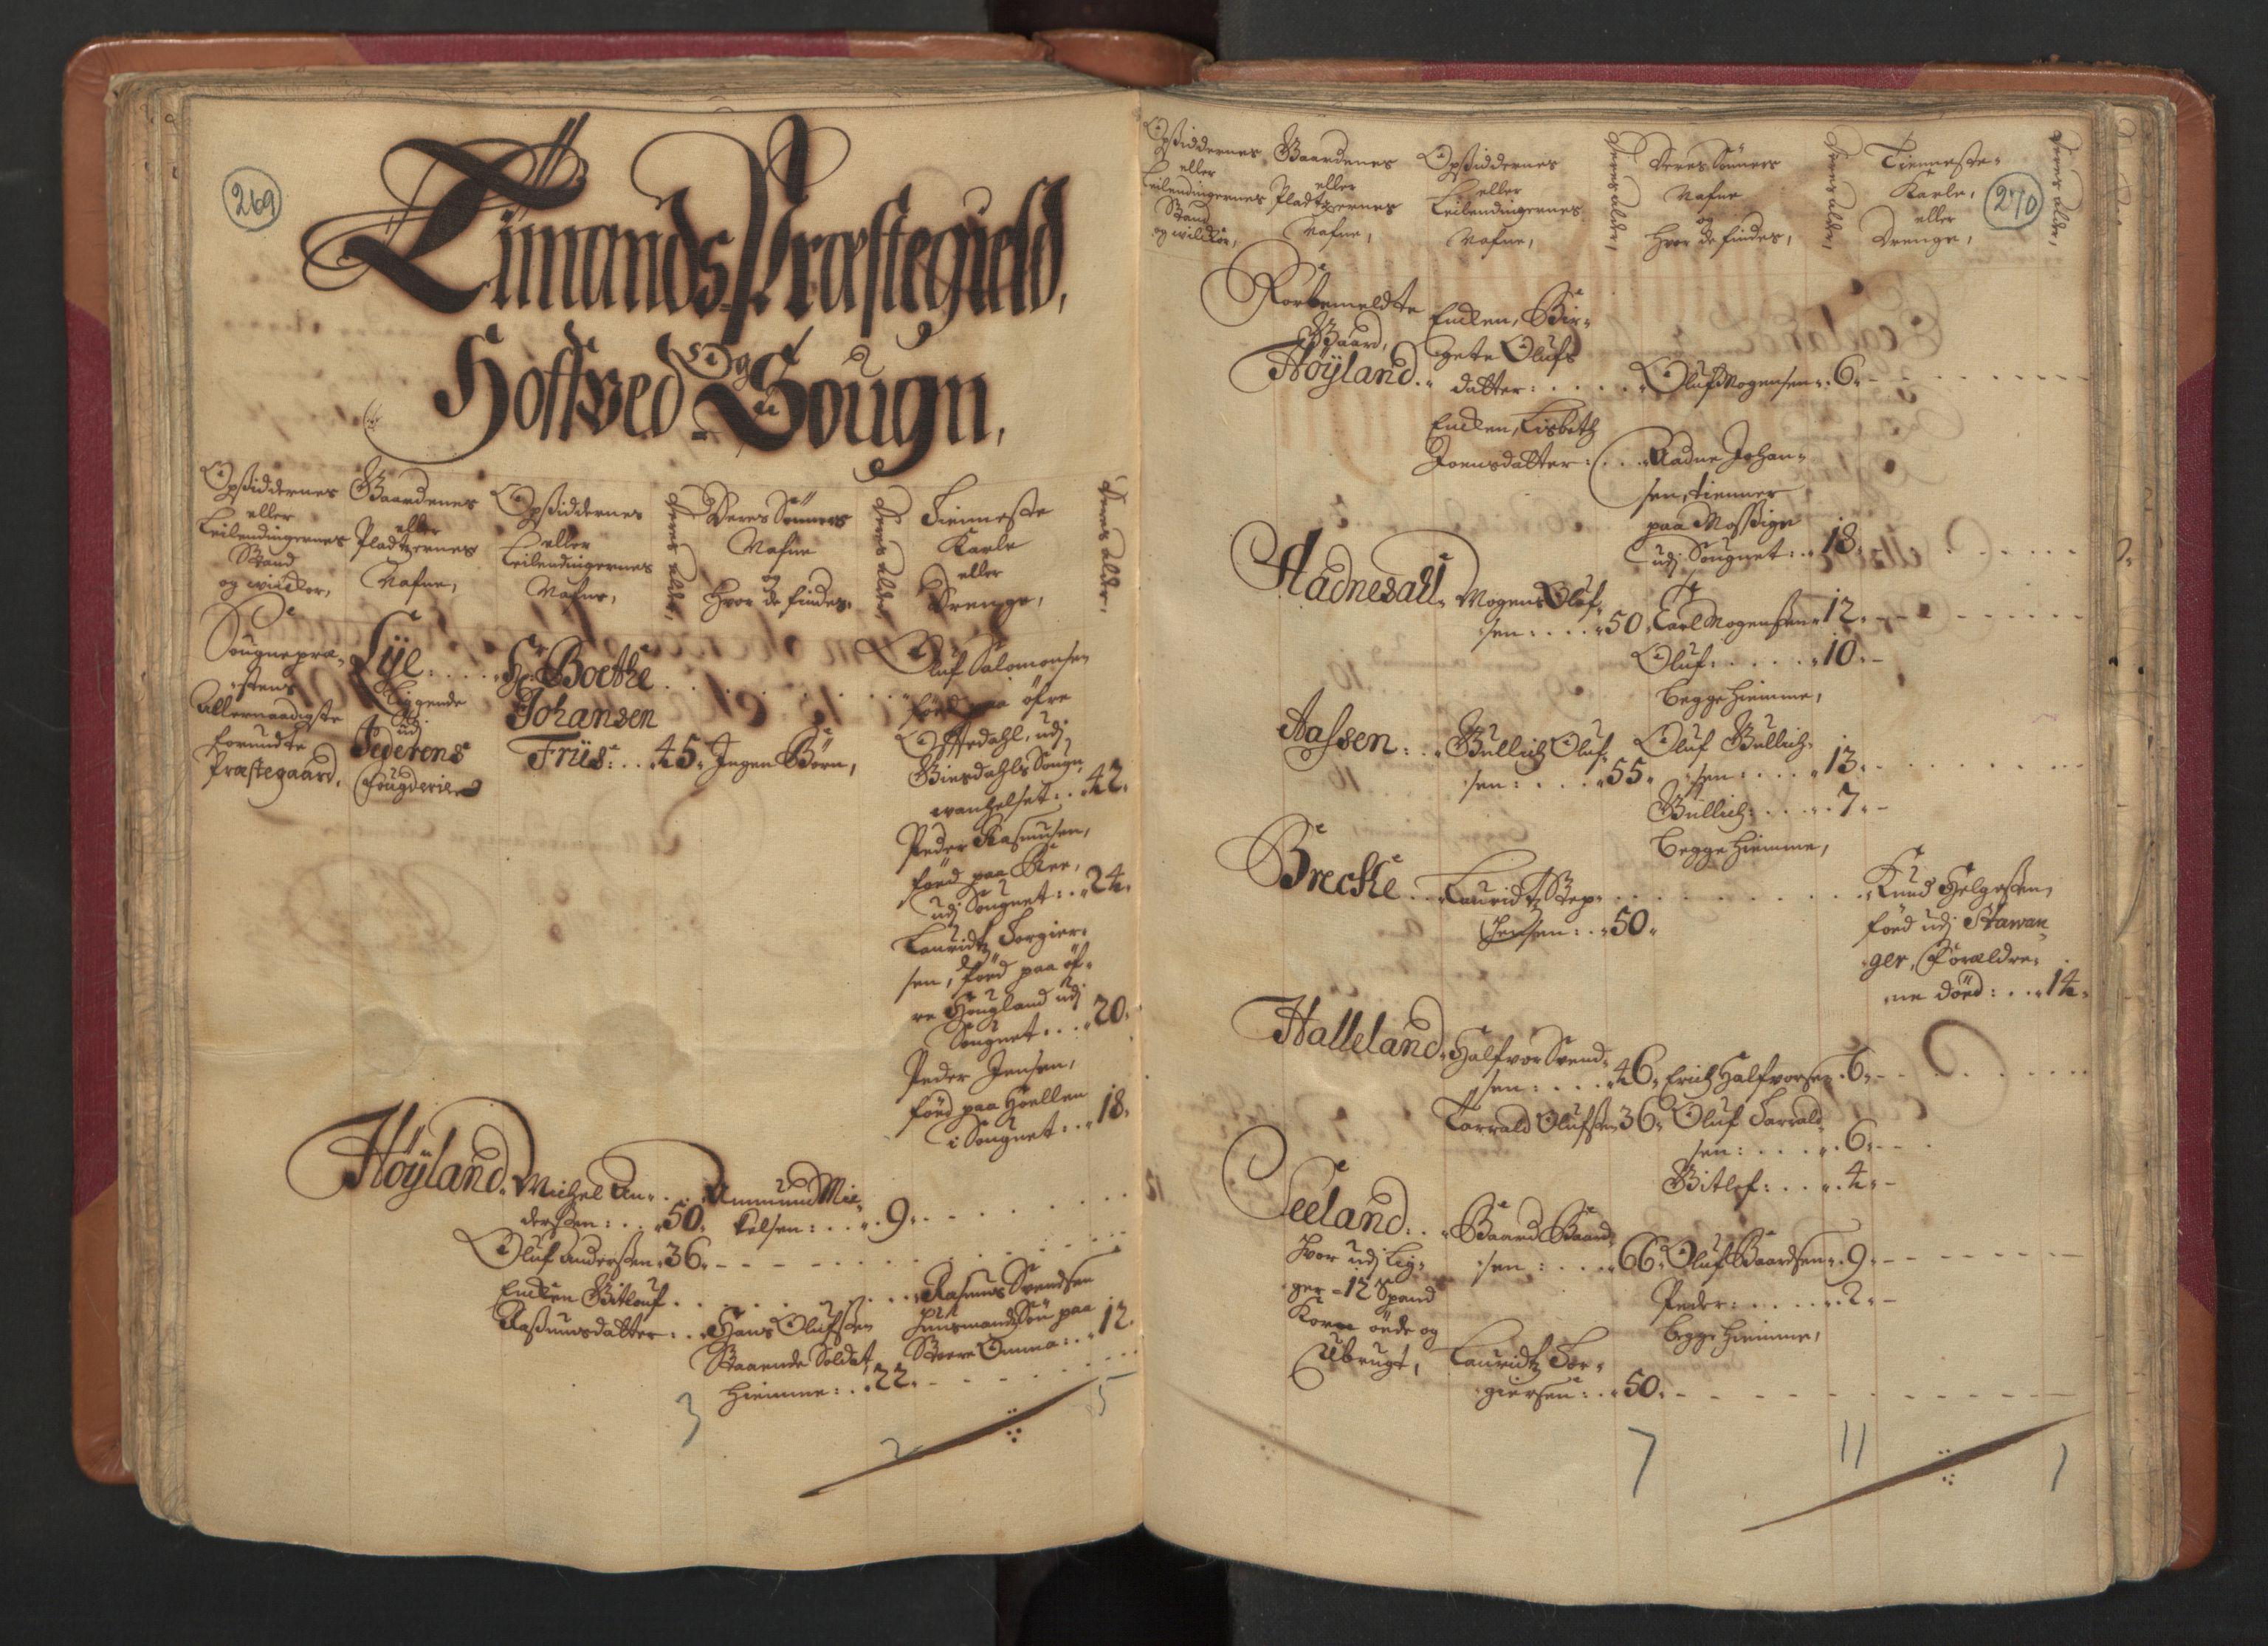 RA, Manntallet 1701, nr. 4: Jæren og Dalane fogderi, 1701, s. 269-270